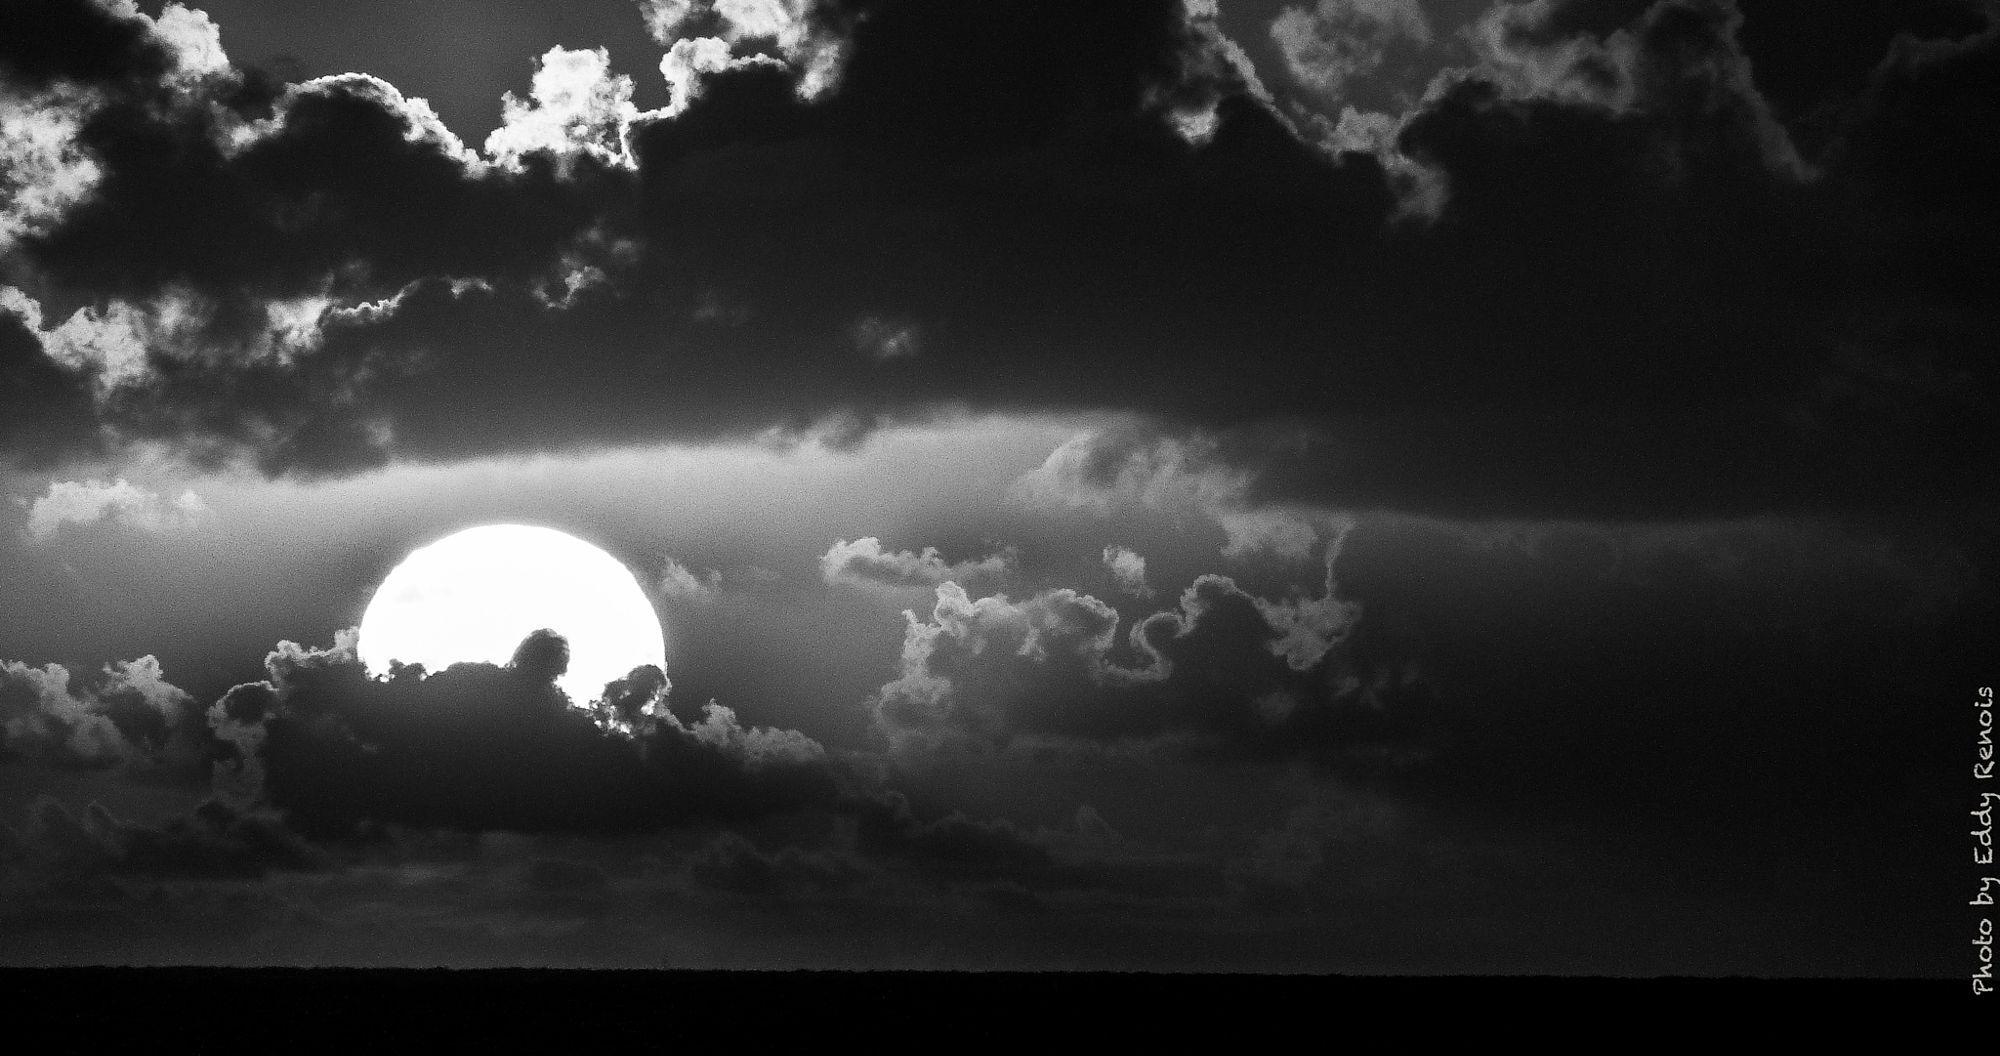 #500px Select #Photography : sun by EddyRenois https://t.co/TCzGLtl2vY   treesskysunrisemorninglakeforestgir  #photography